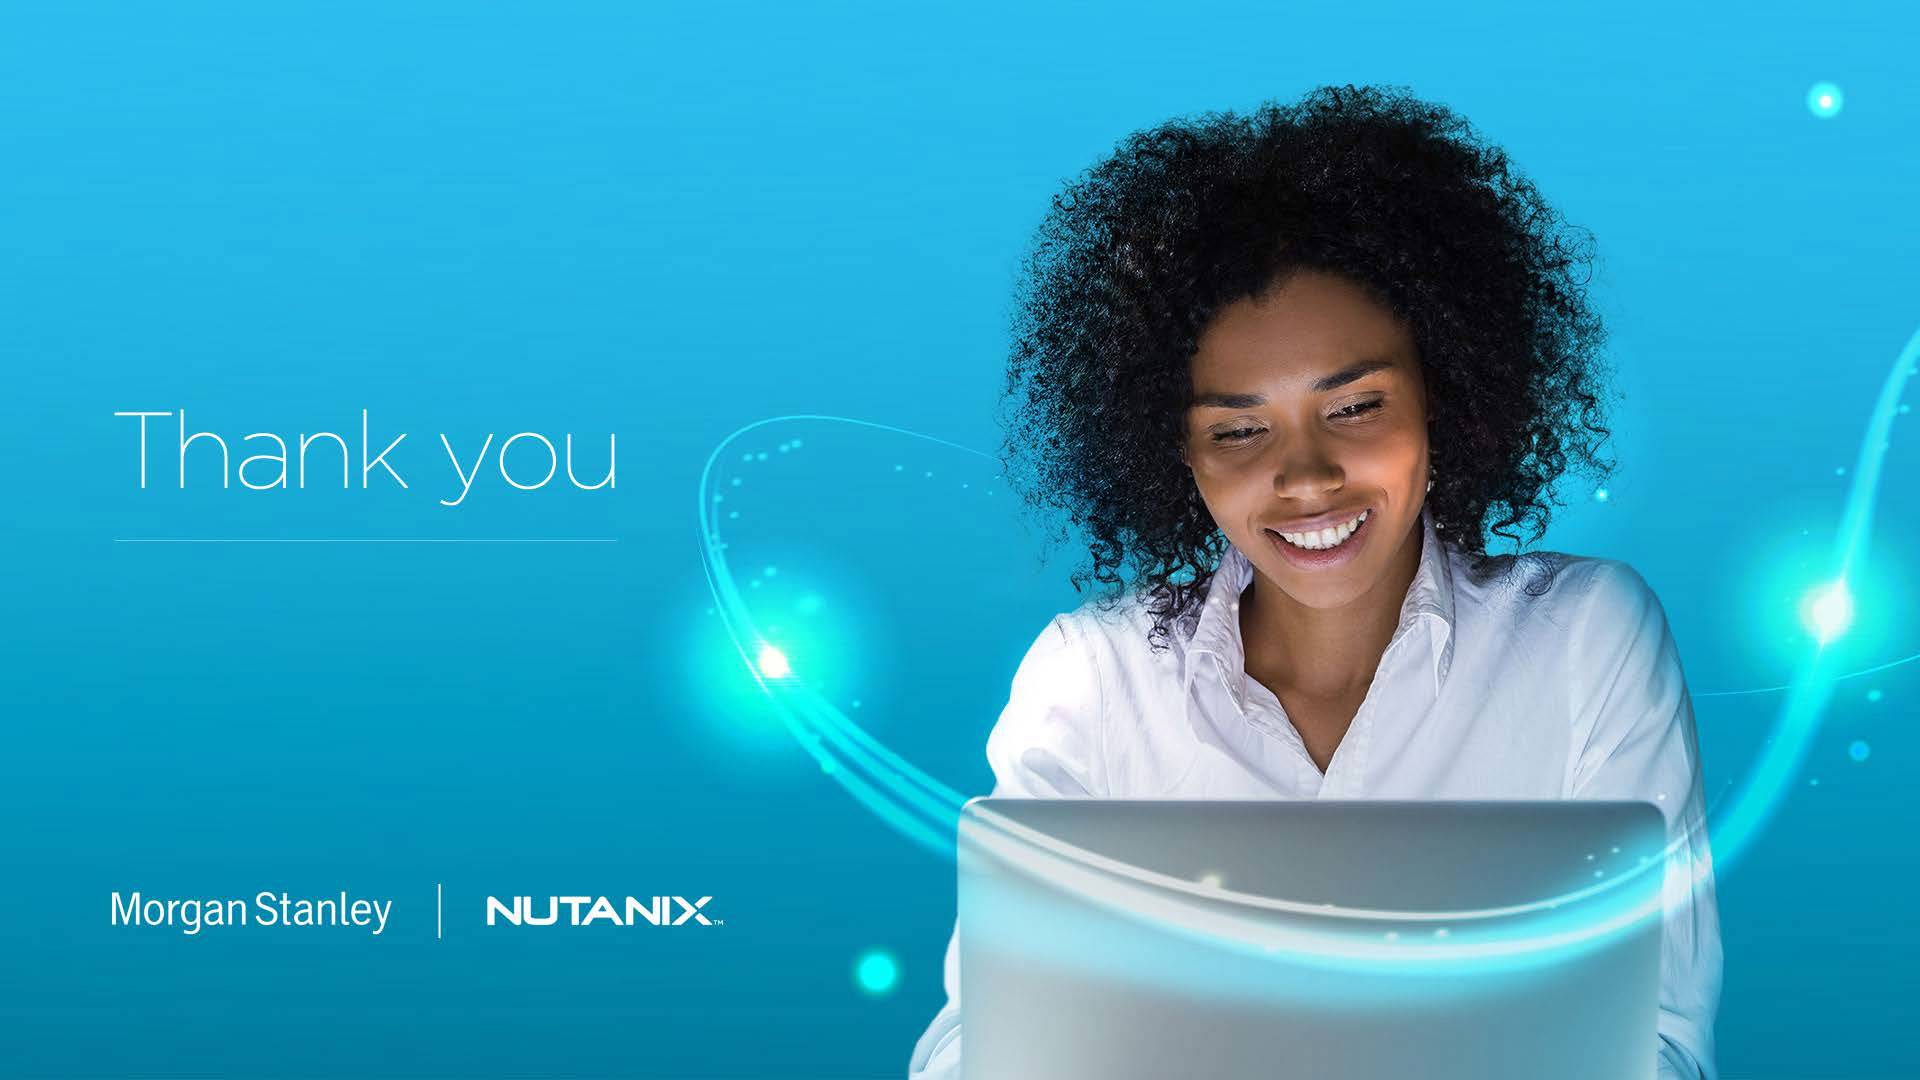 02078_Nutanix_Morgan_Stanley-Presentation_v1.6-12